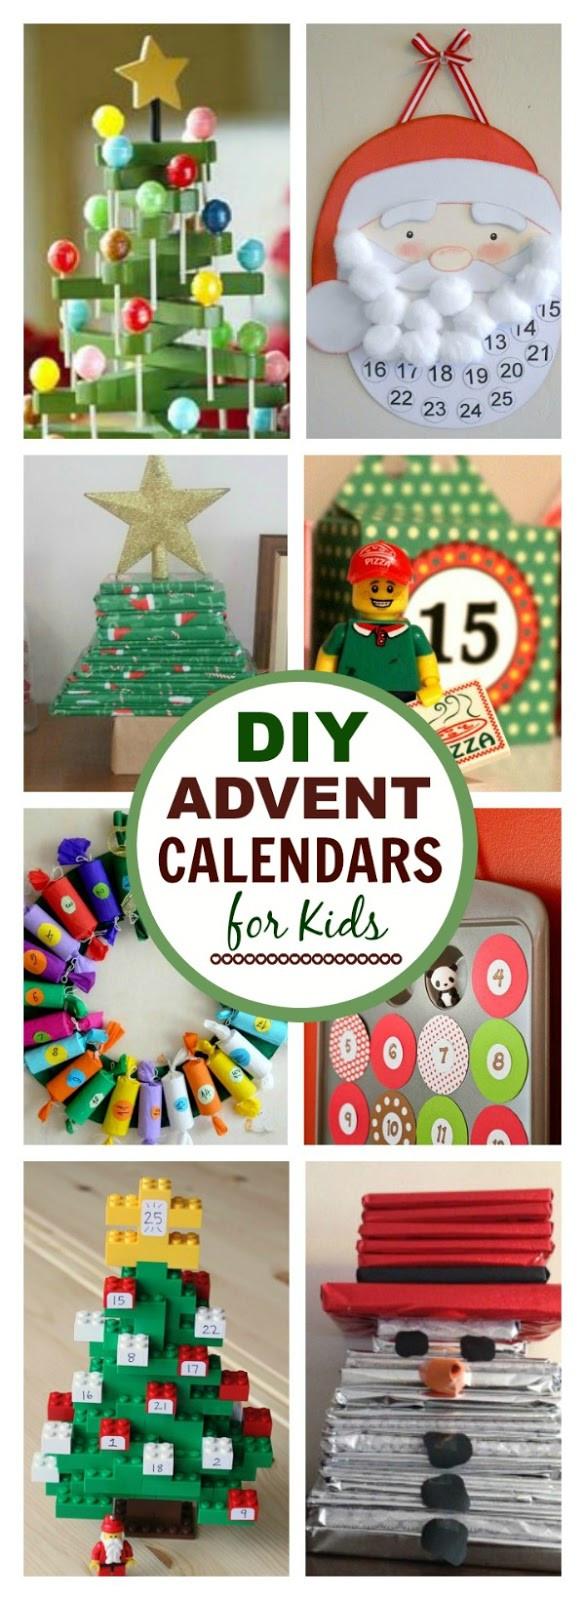 DIY Advent Calendars For Kids  Christmas Advent Calendars for Kids